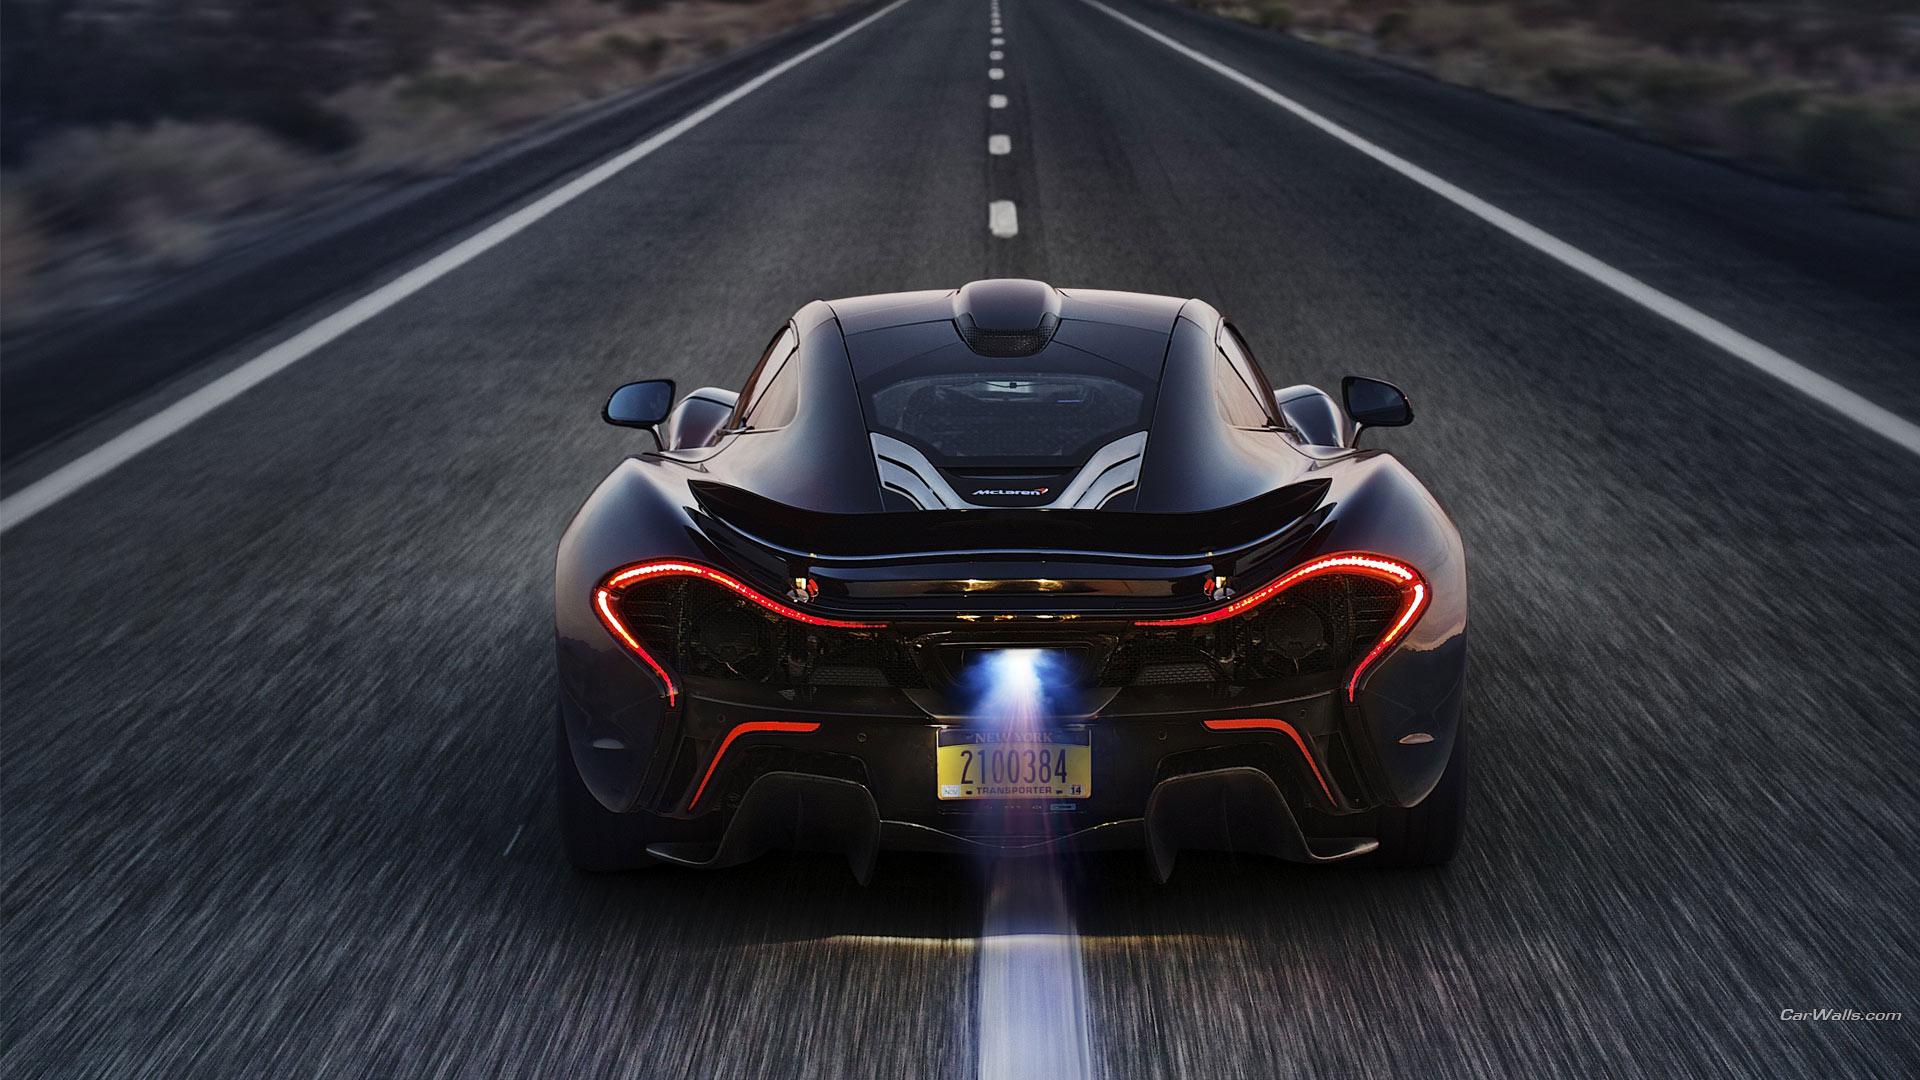 Fondos De Vehiculos: McLaren P1 Fondos De Pantalla, Fondos De Escritorio